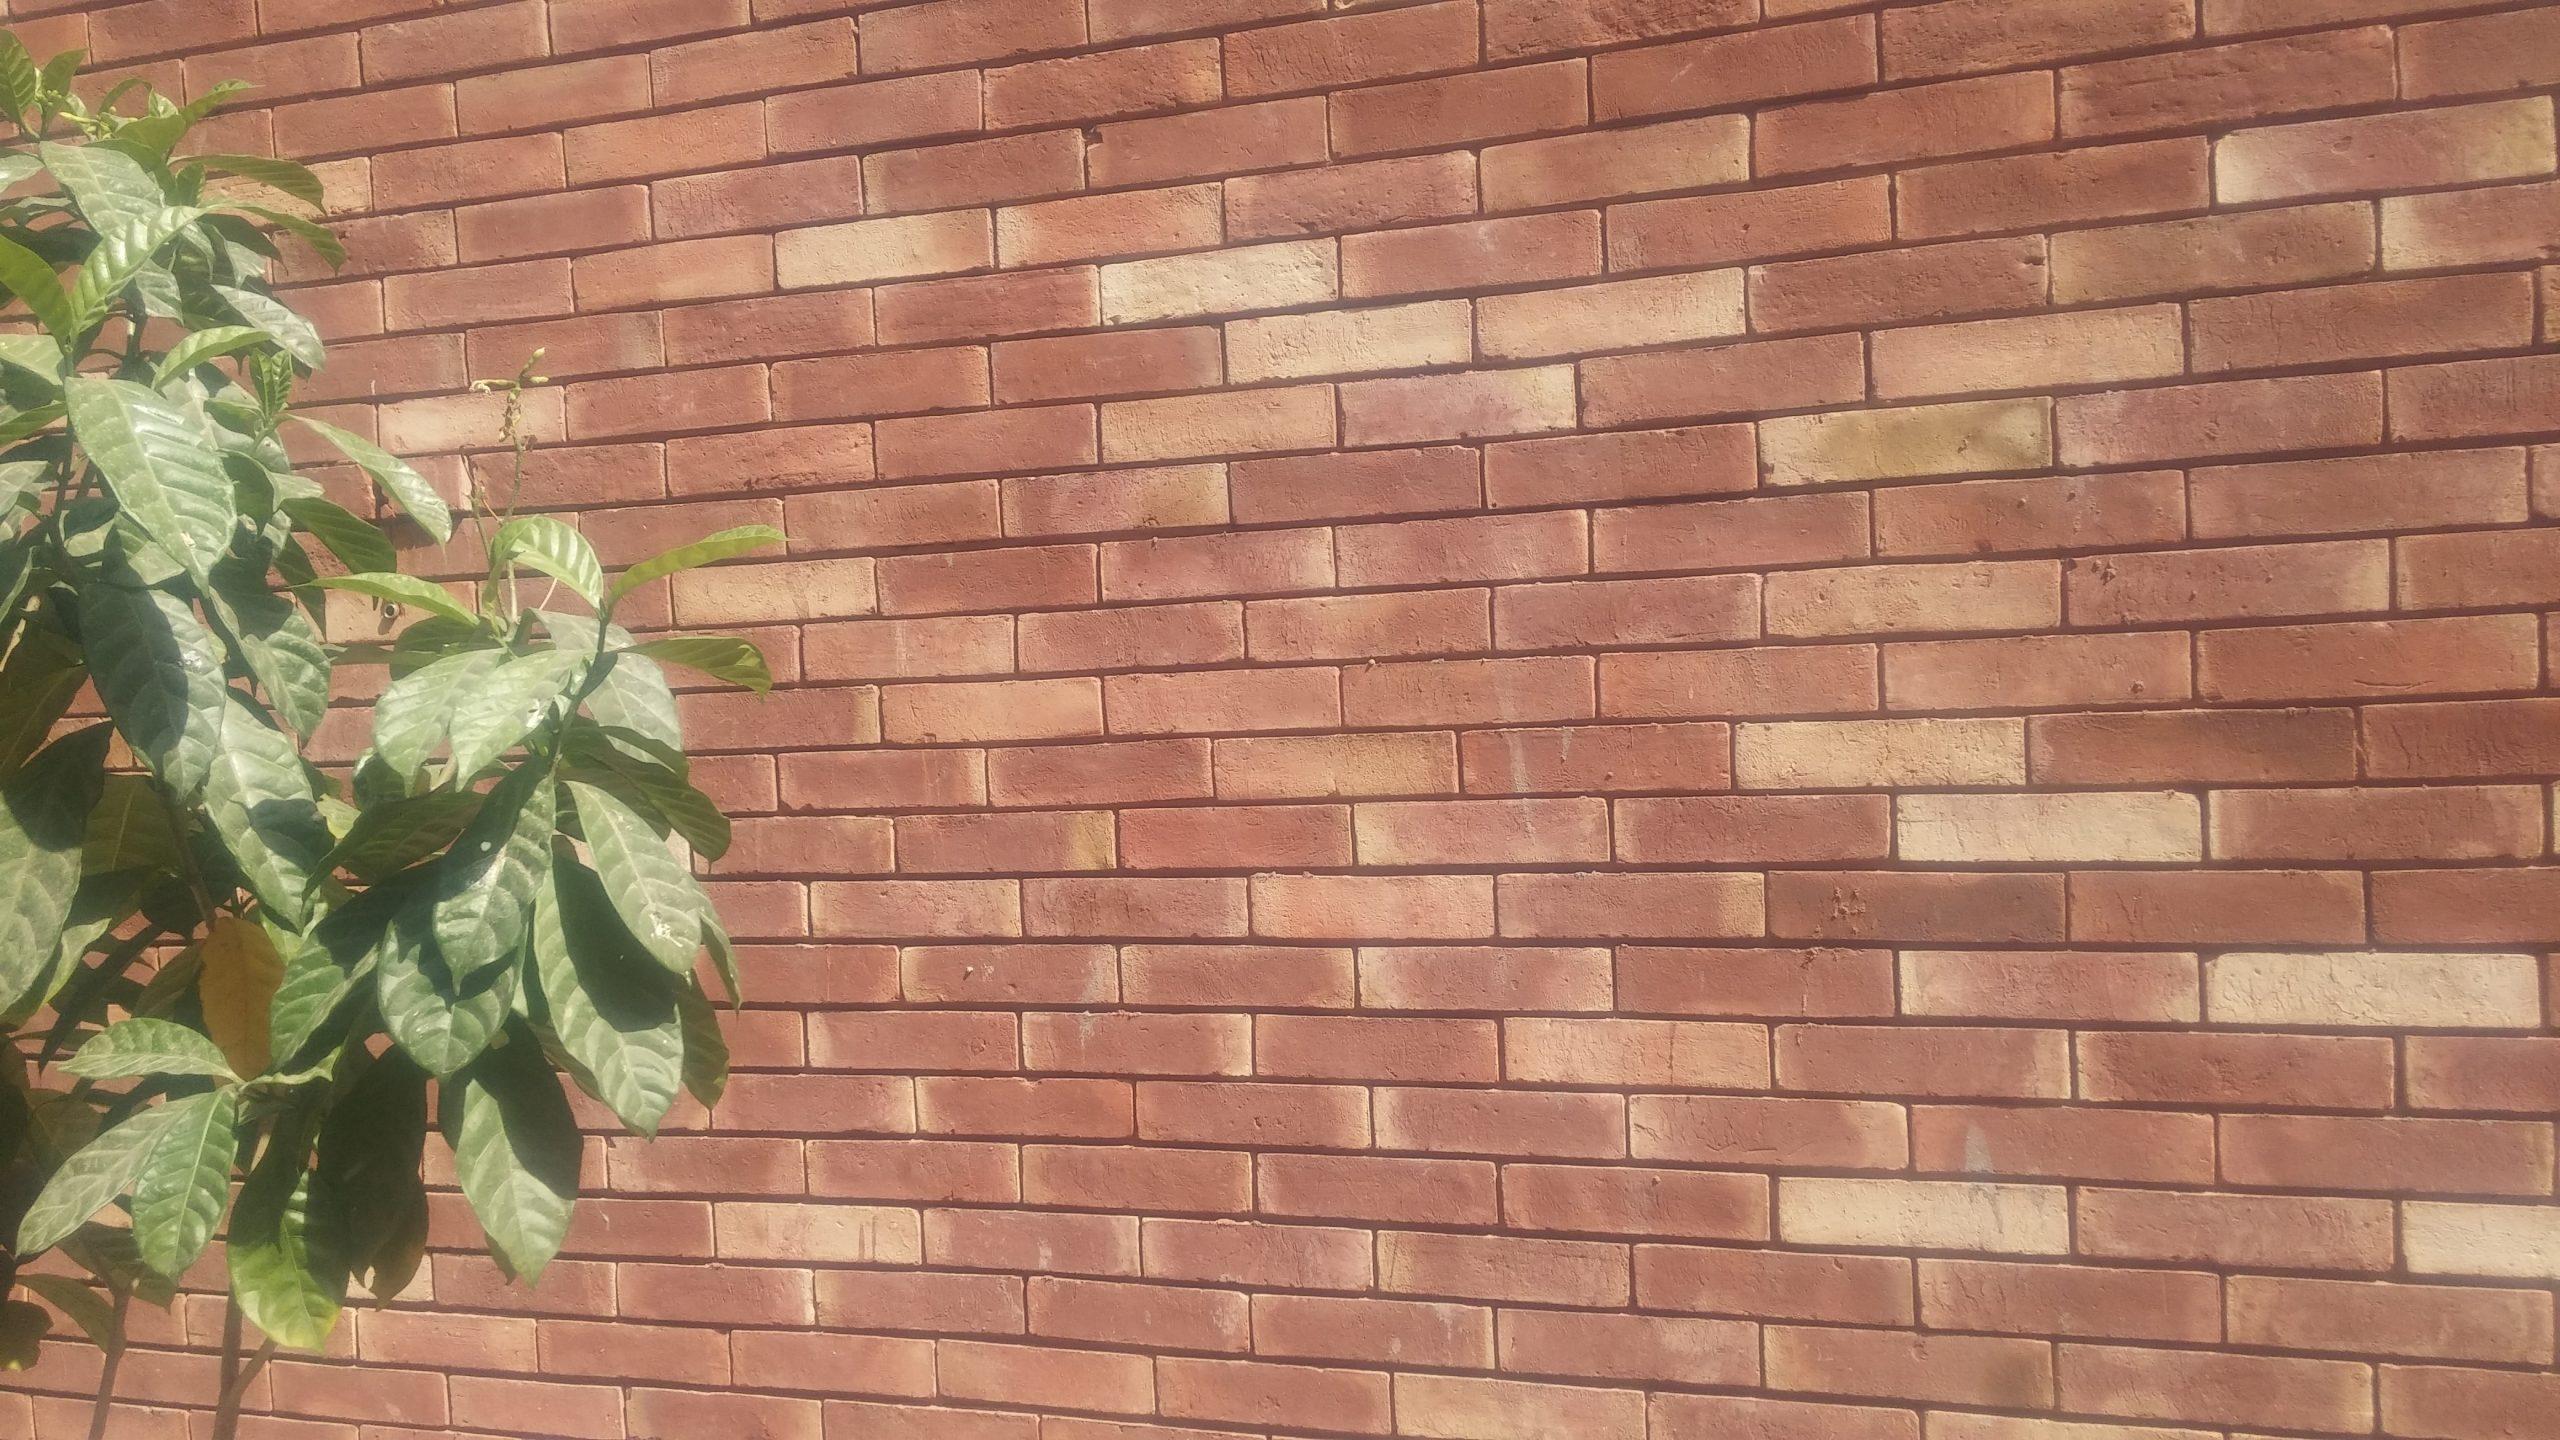 Gutka Tile Rate in Rawalpindi Pak Clay Tiles Lahore Brick Tiles Price in Pakistan Images (6)